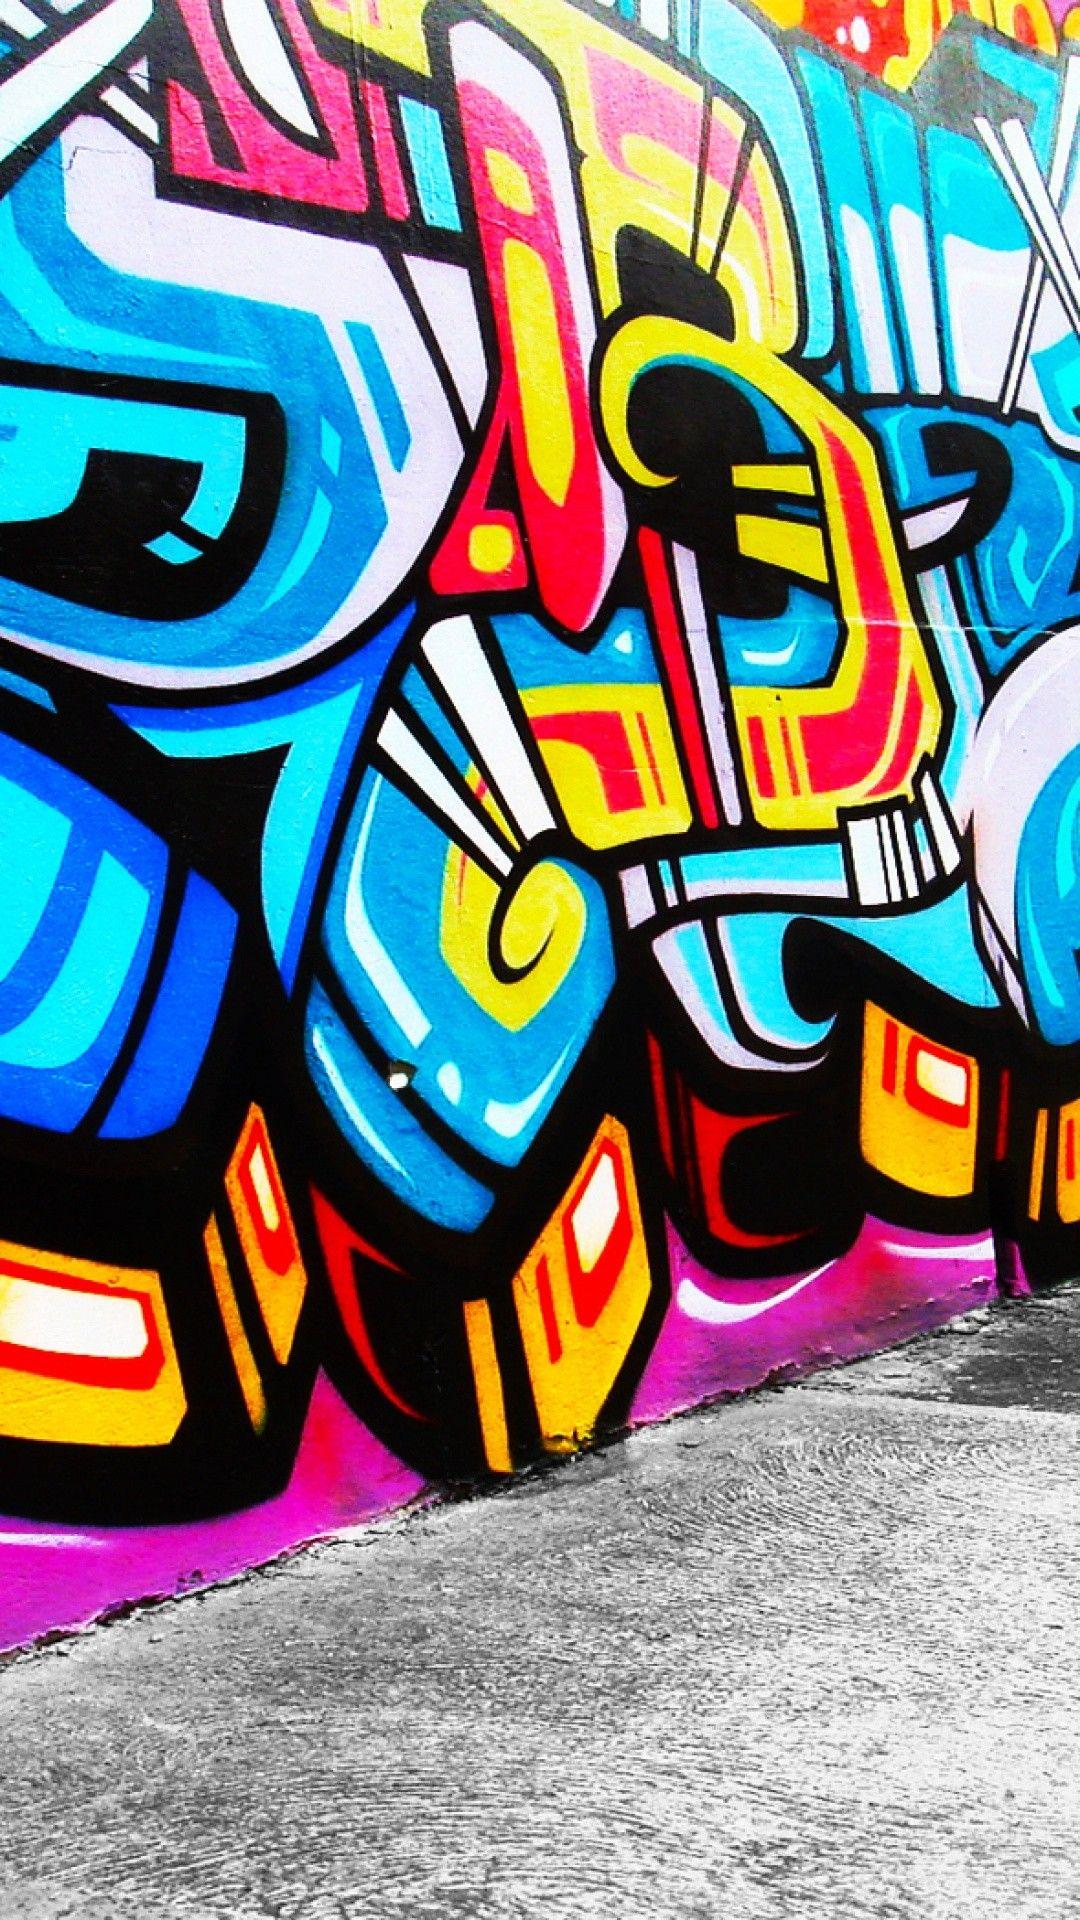 Graffiti iPhone 7 Plus Wallpaper Best HD Wallpapers